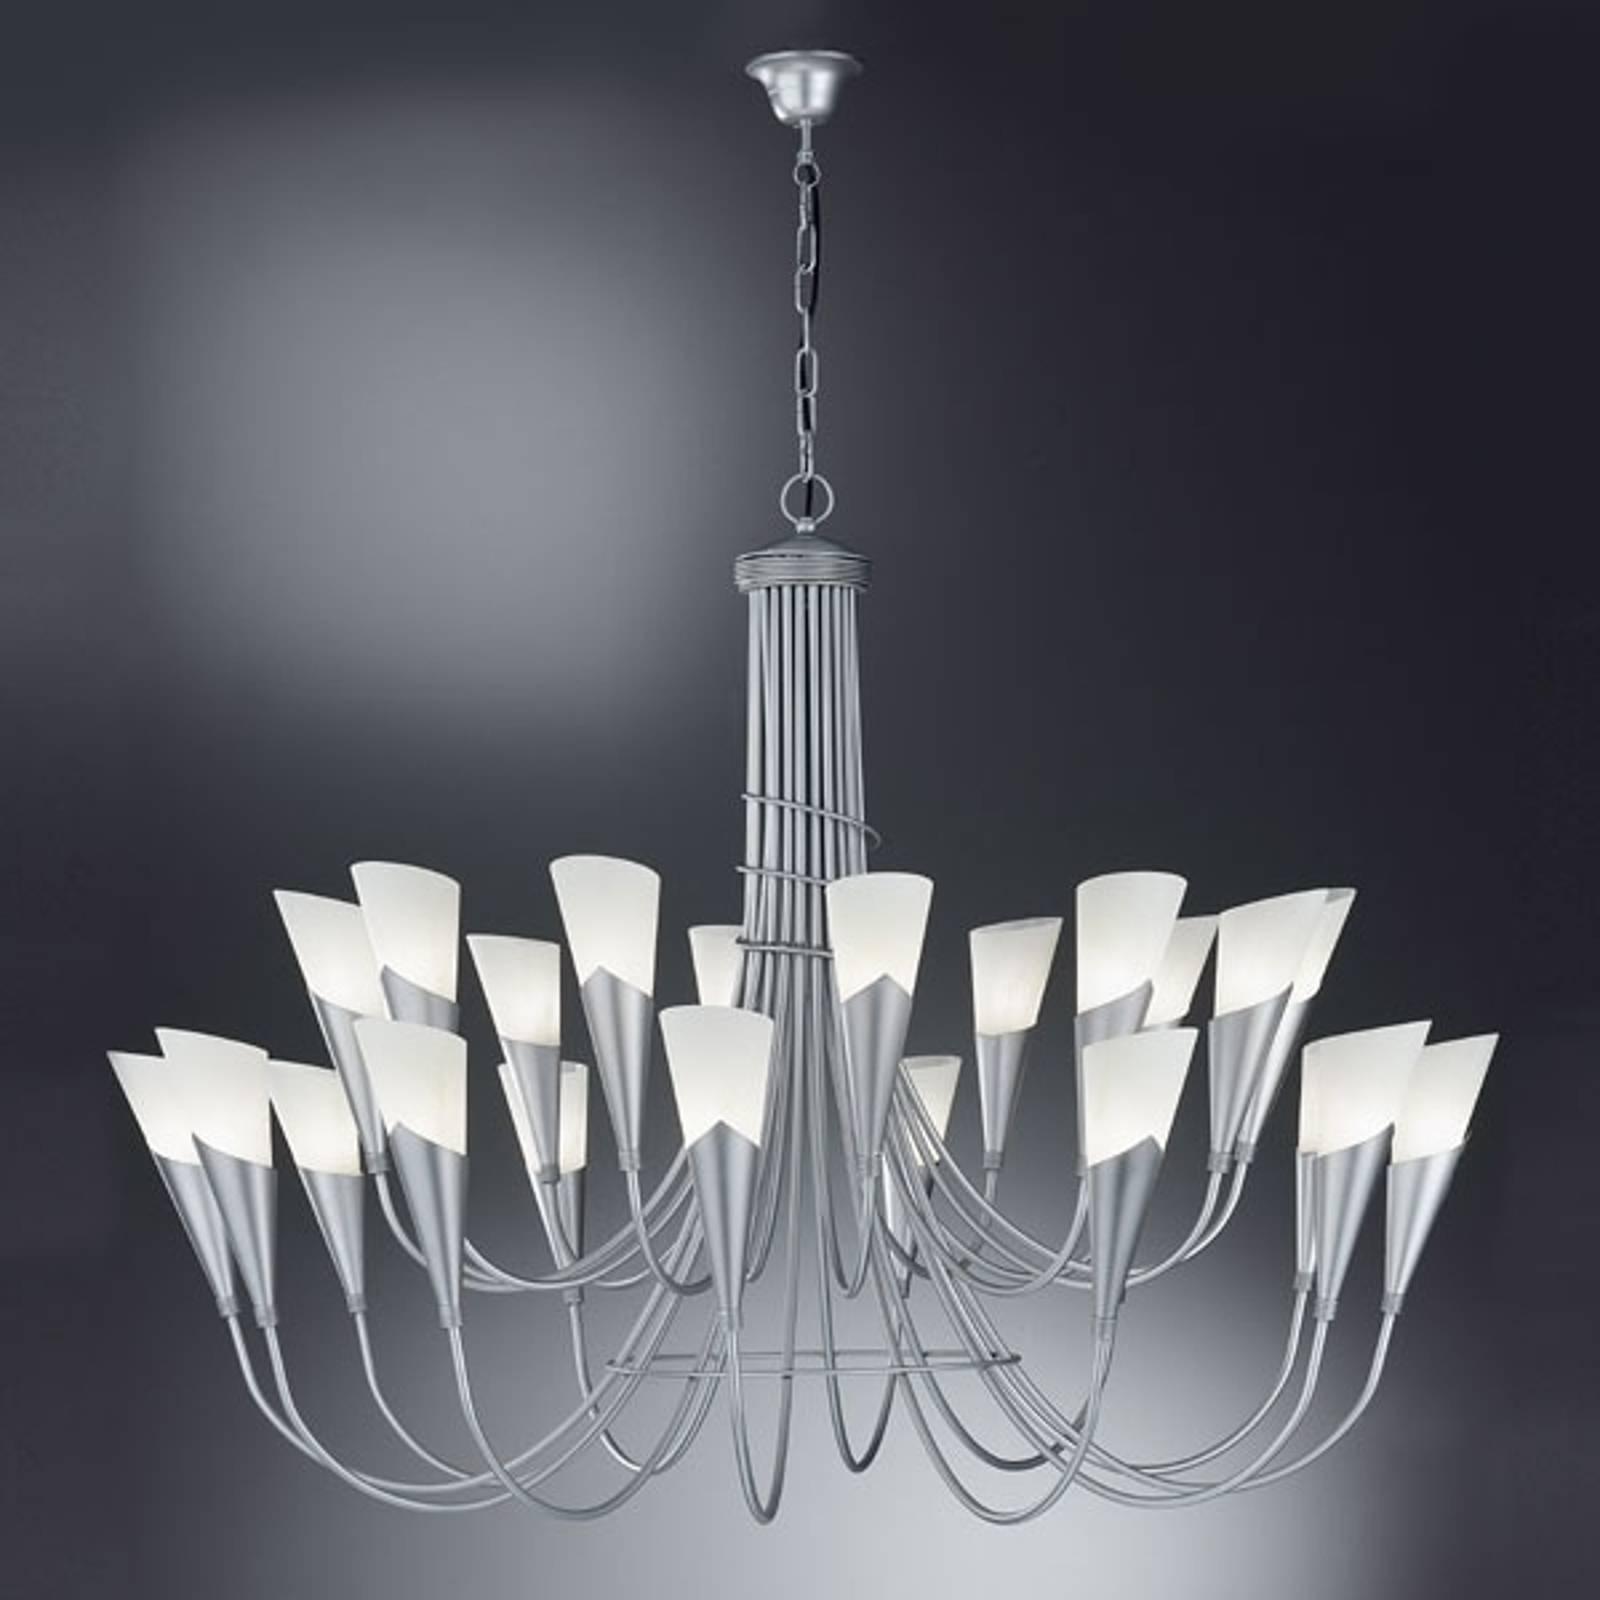 Kroonluchter CAMPAGNOLA, 24-lichts, zilverkleurig